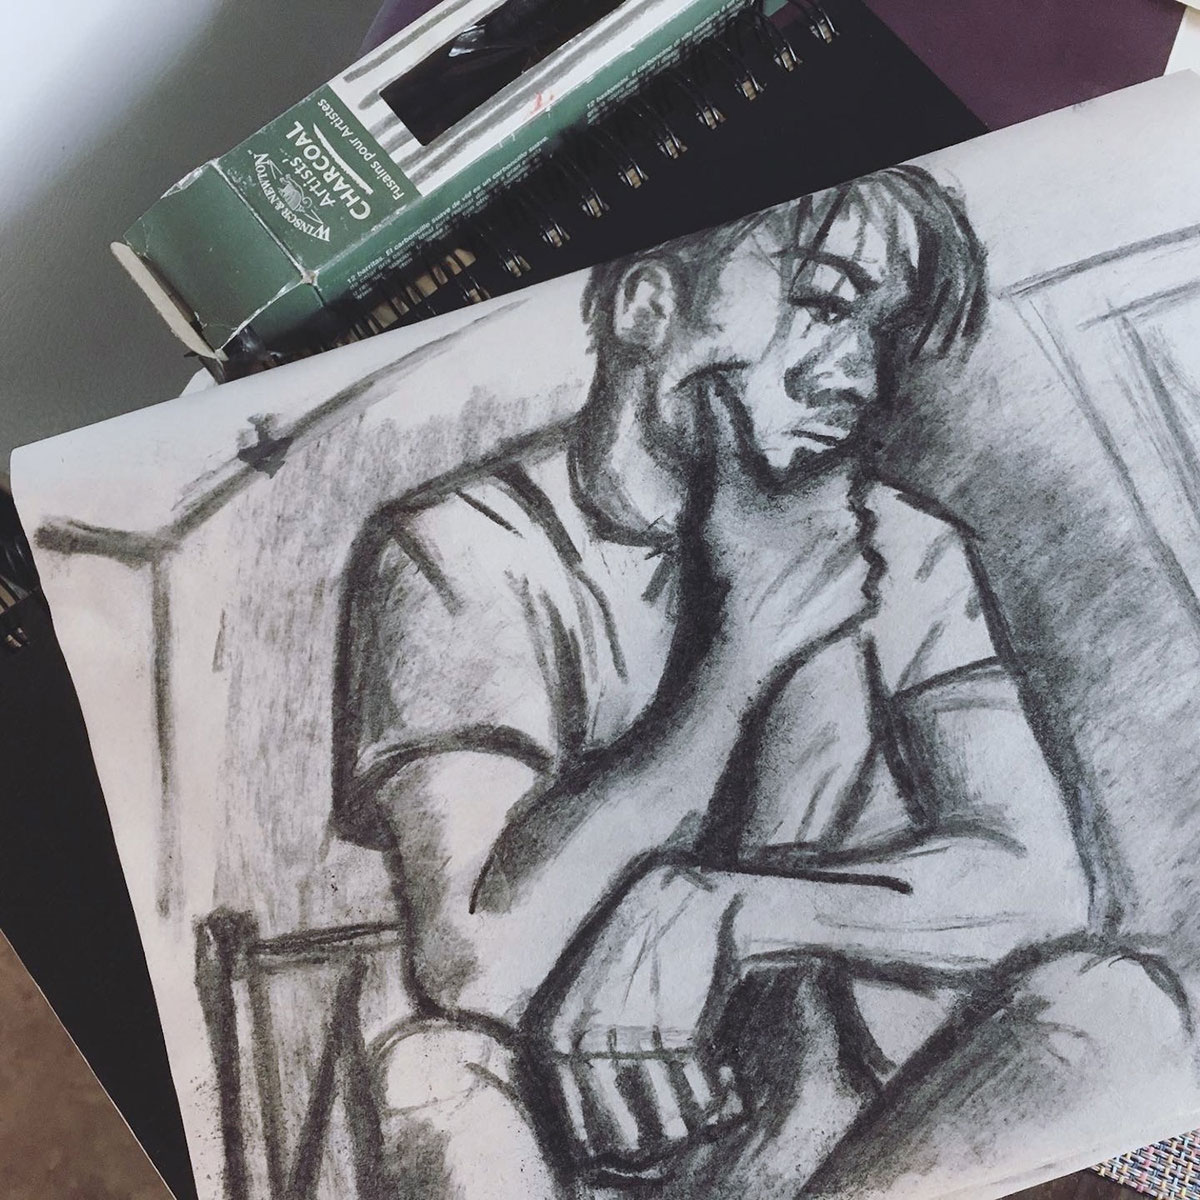 Drop in figure drawing